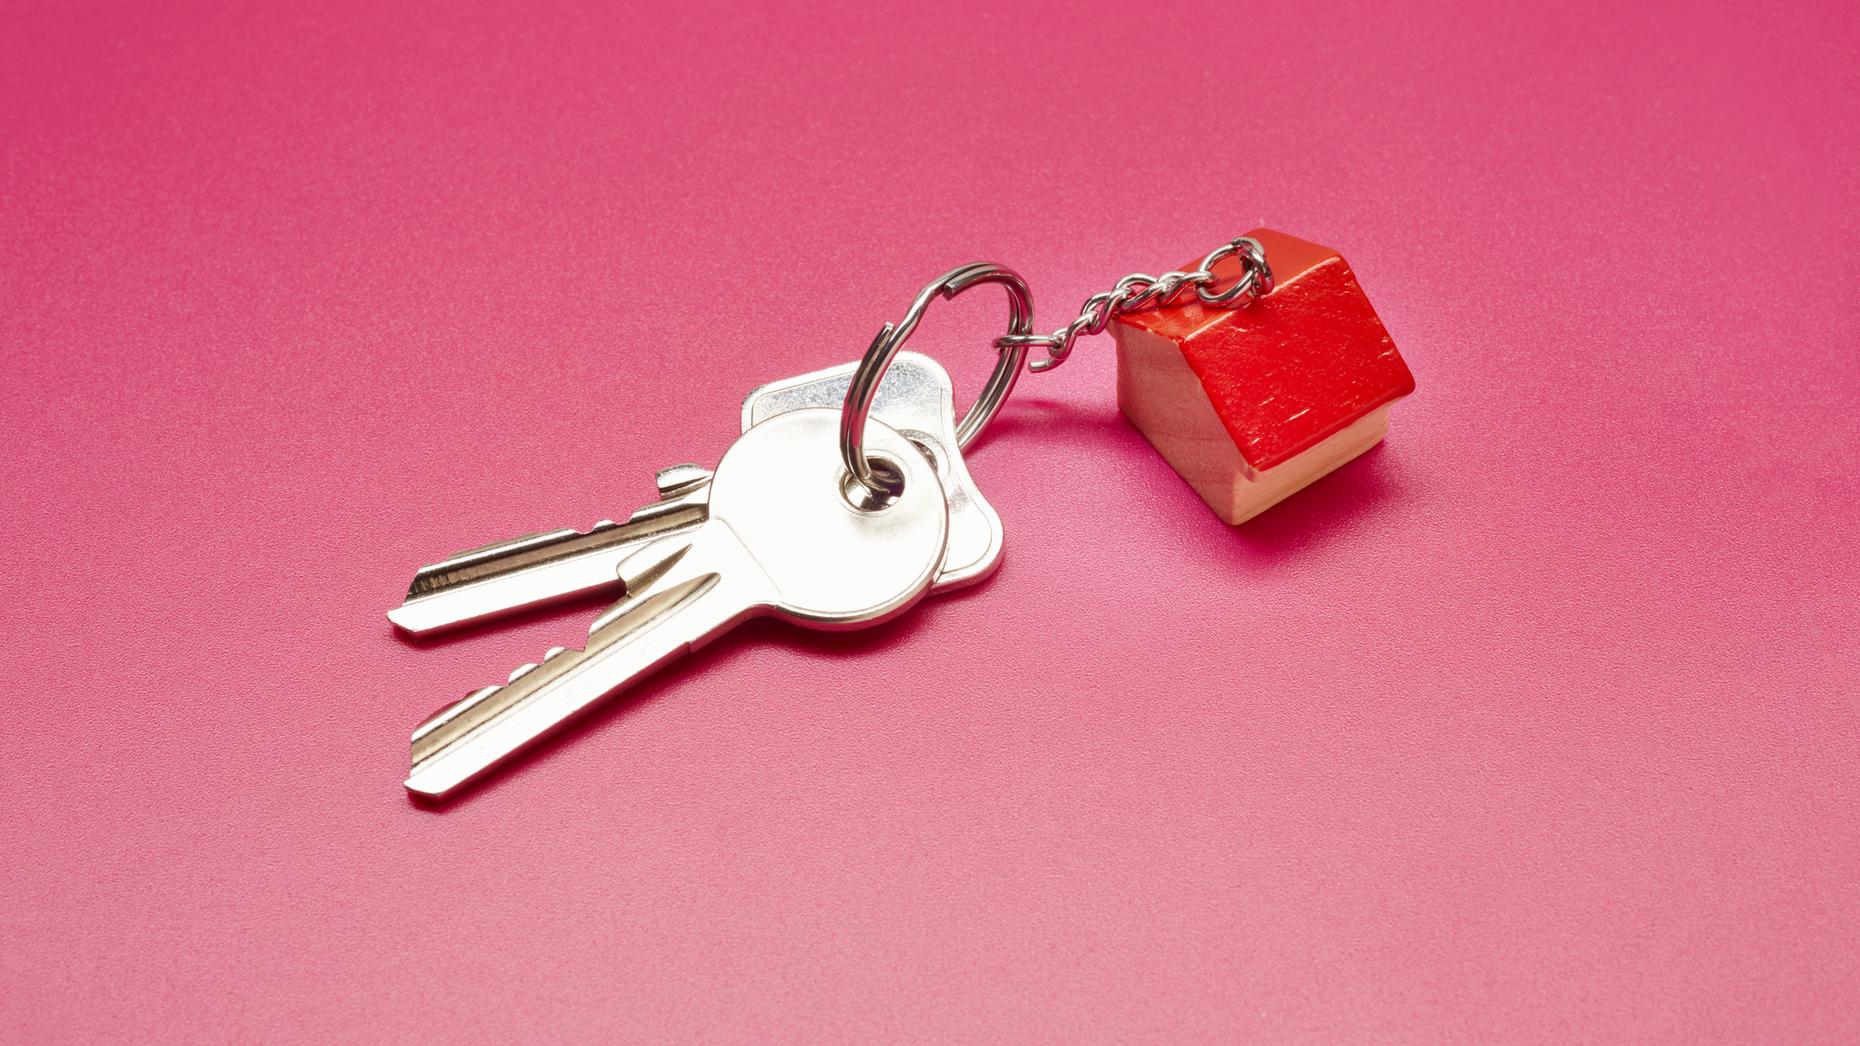 Single-family rent growth dips in December: CoreLogic